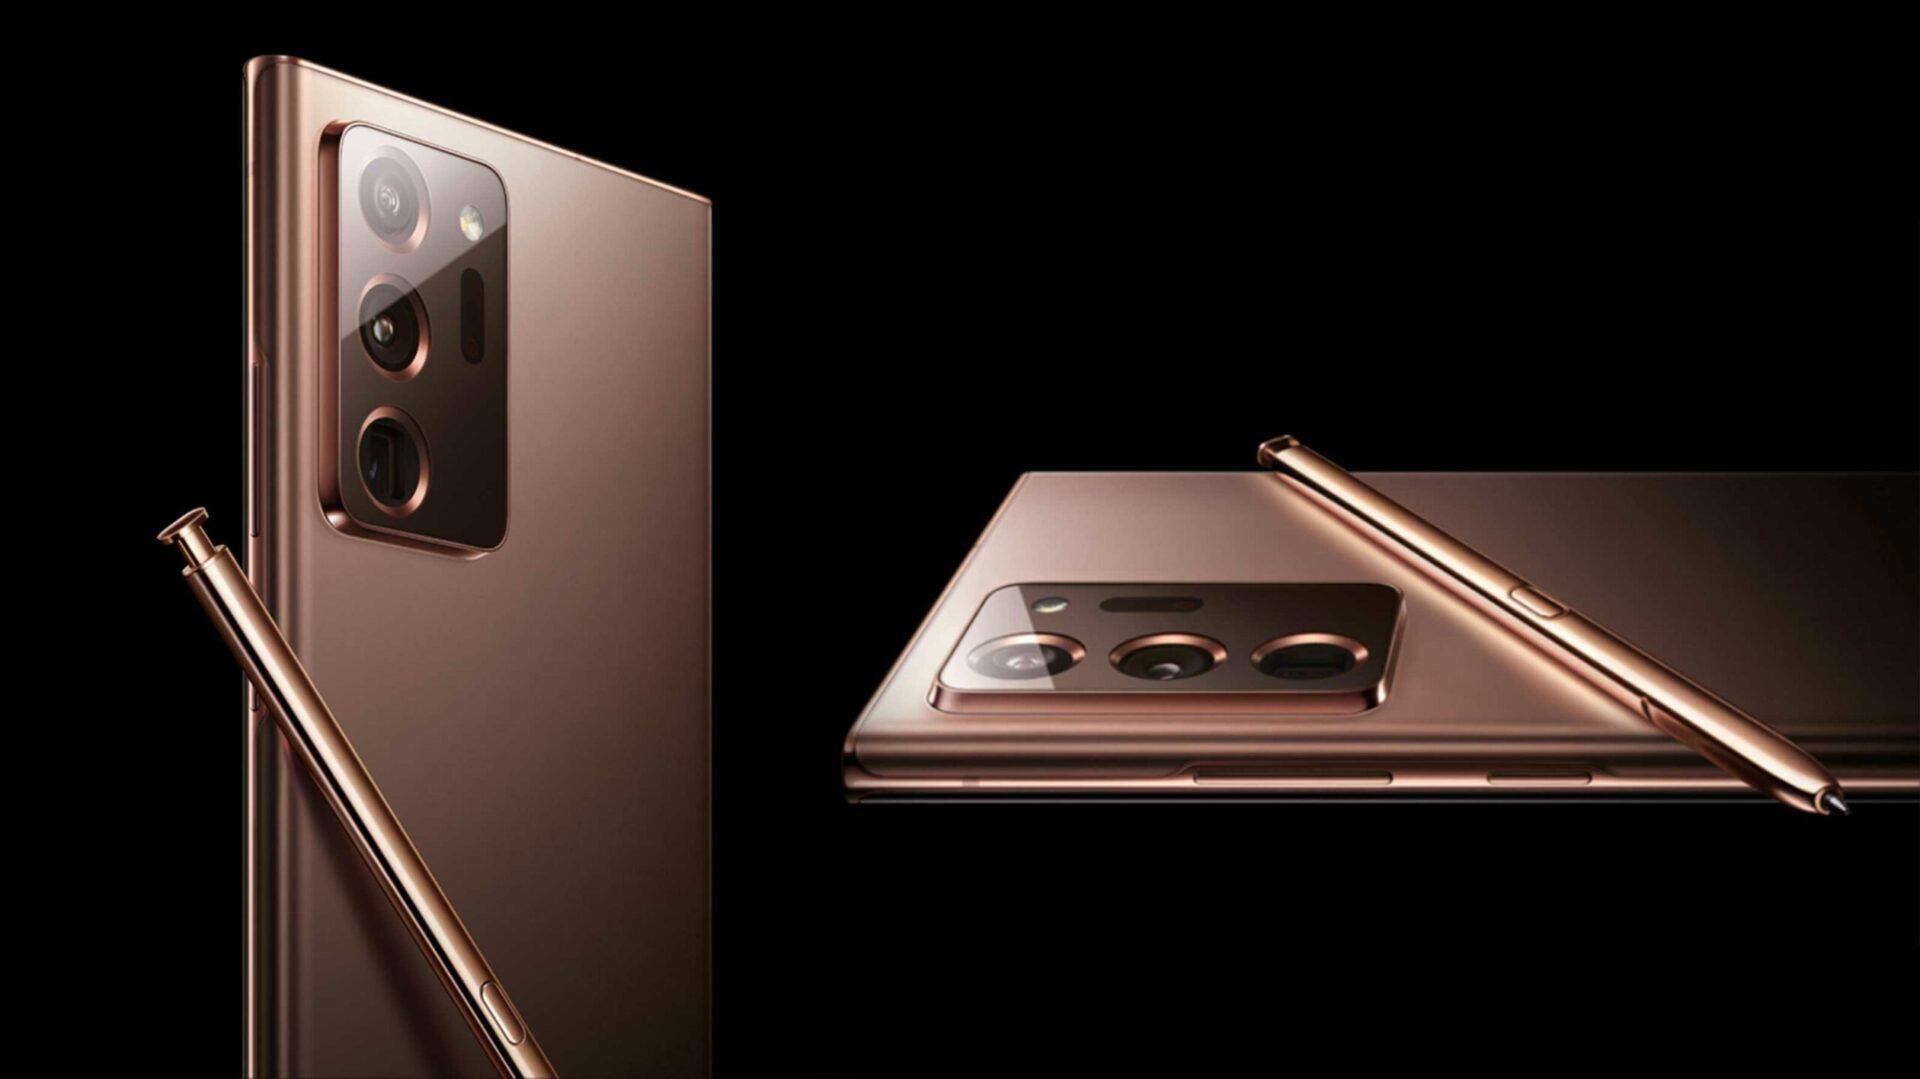 Galaxy Note 20 Ultra si mostra in una nuova immagine a 360 gradi